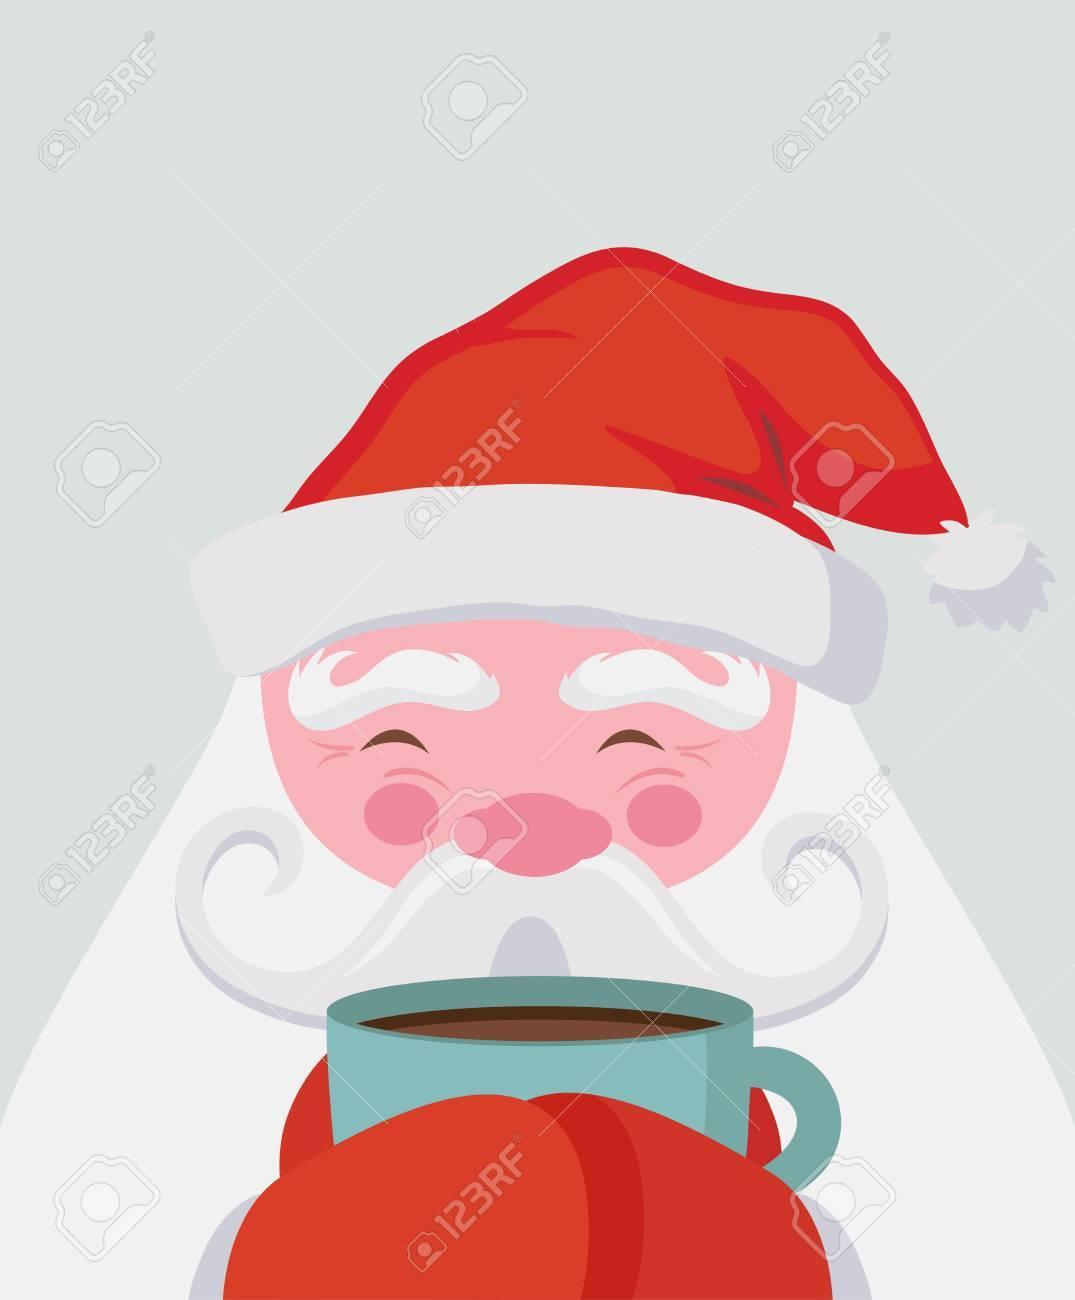 Santa drinking a hot drink and warm himself. Vector christmas illustration - 87346314